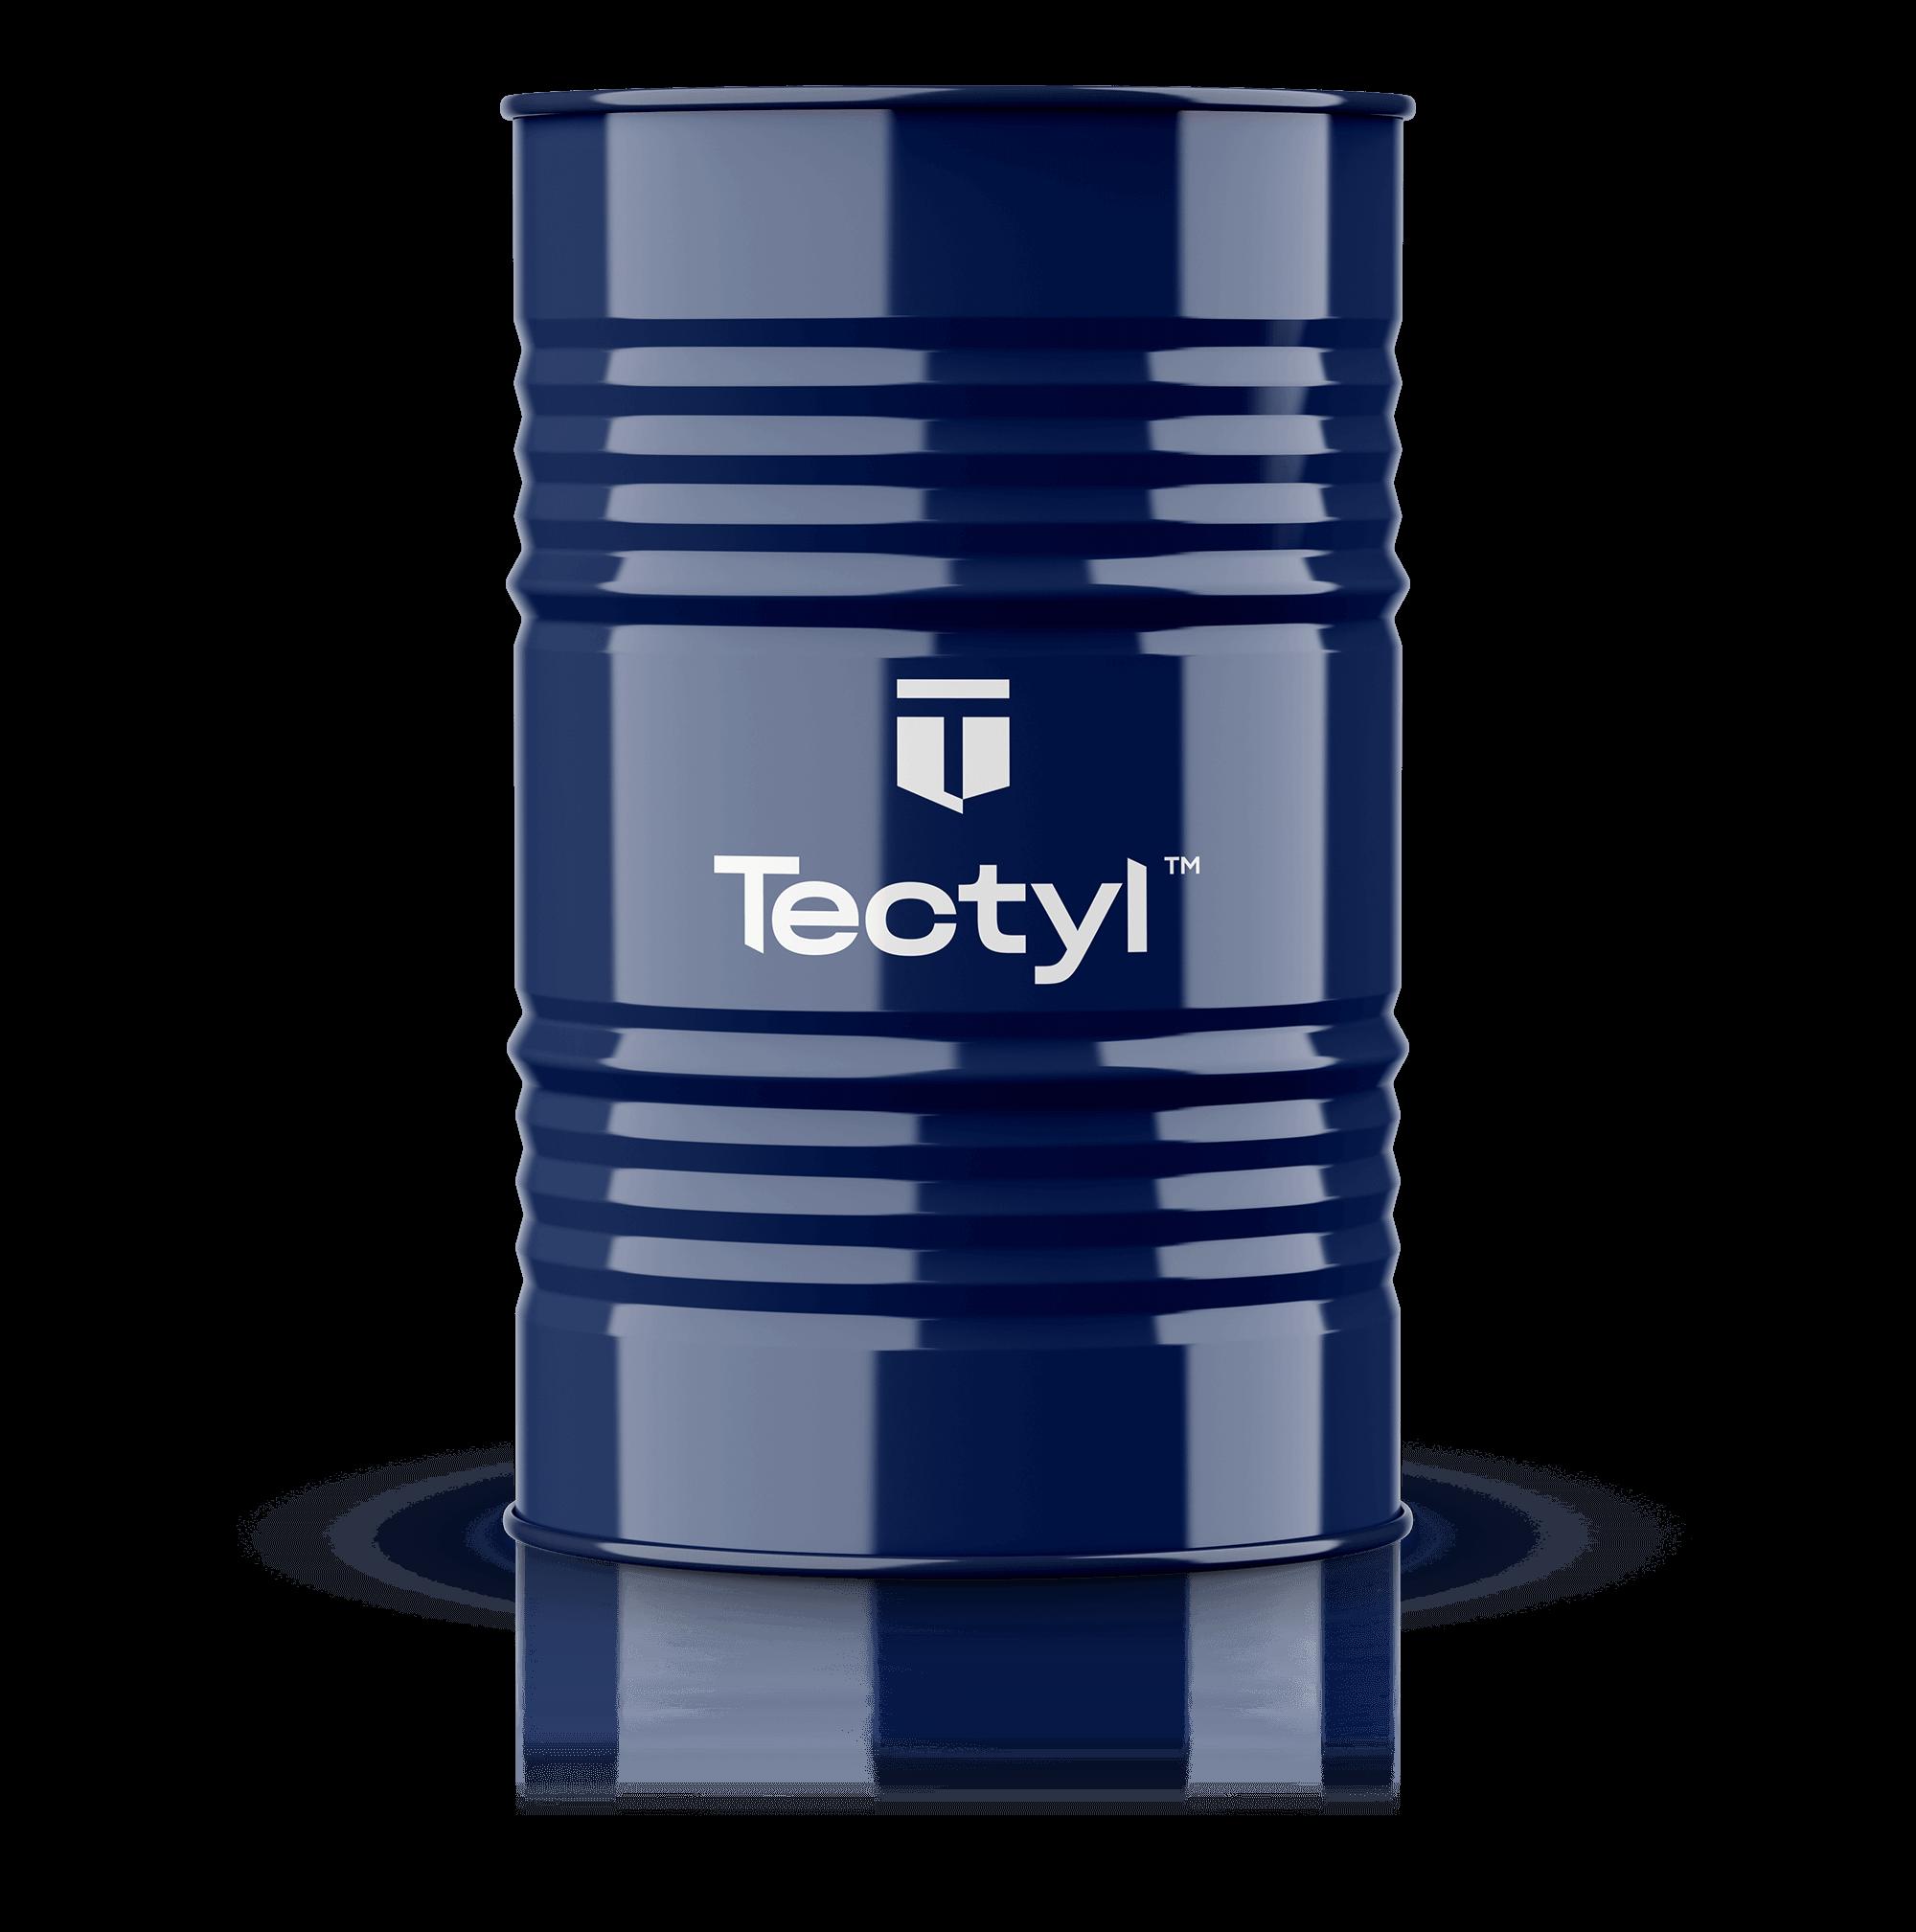 Valvoline - Tectyl - Drum blue-shine